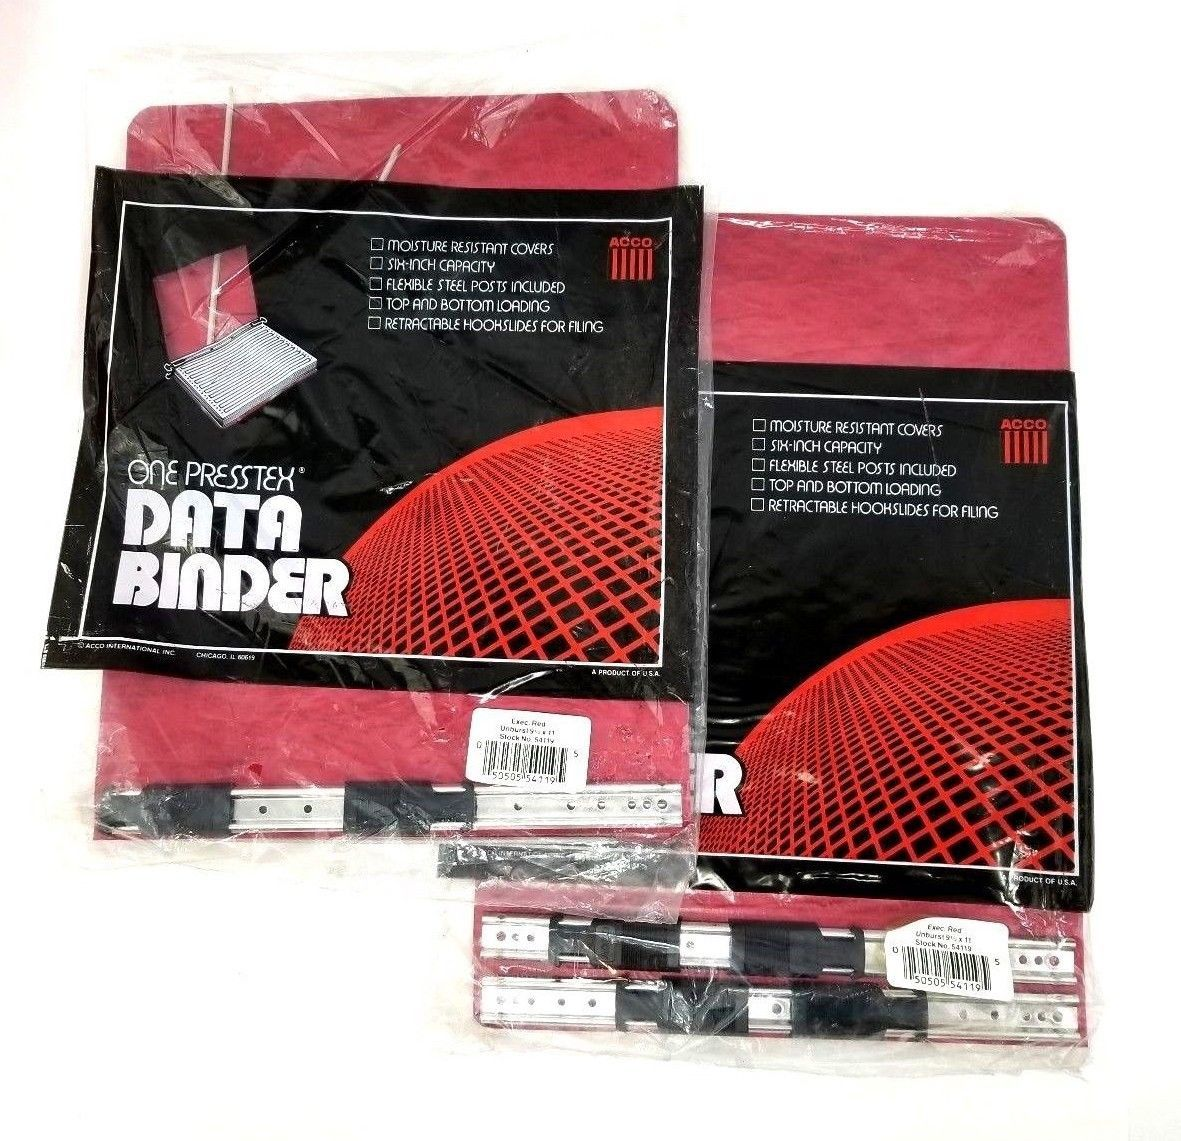 "Acco Prestex Data Binder Executive Red Unburst 9 1/2"" x 11"" Data Binders (2) New"